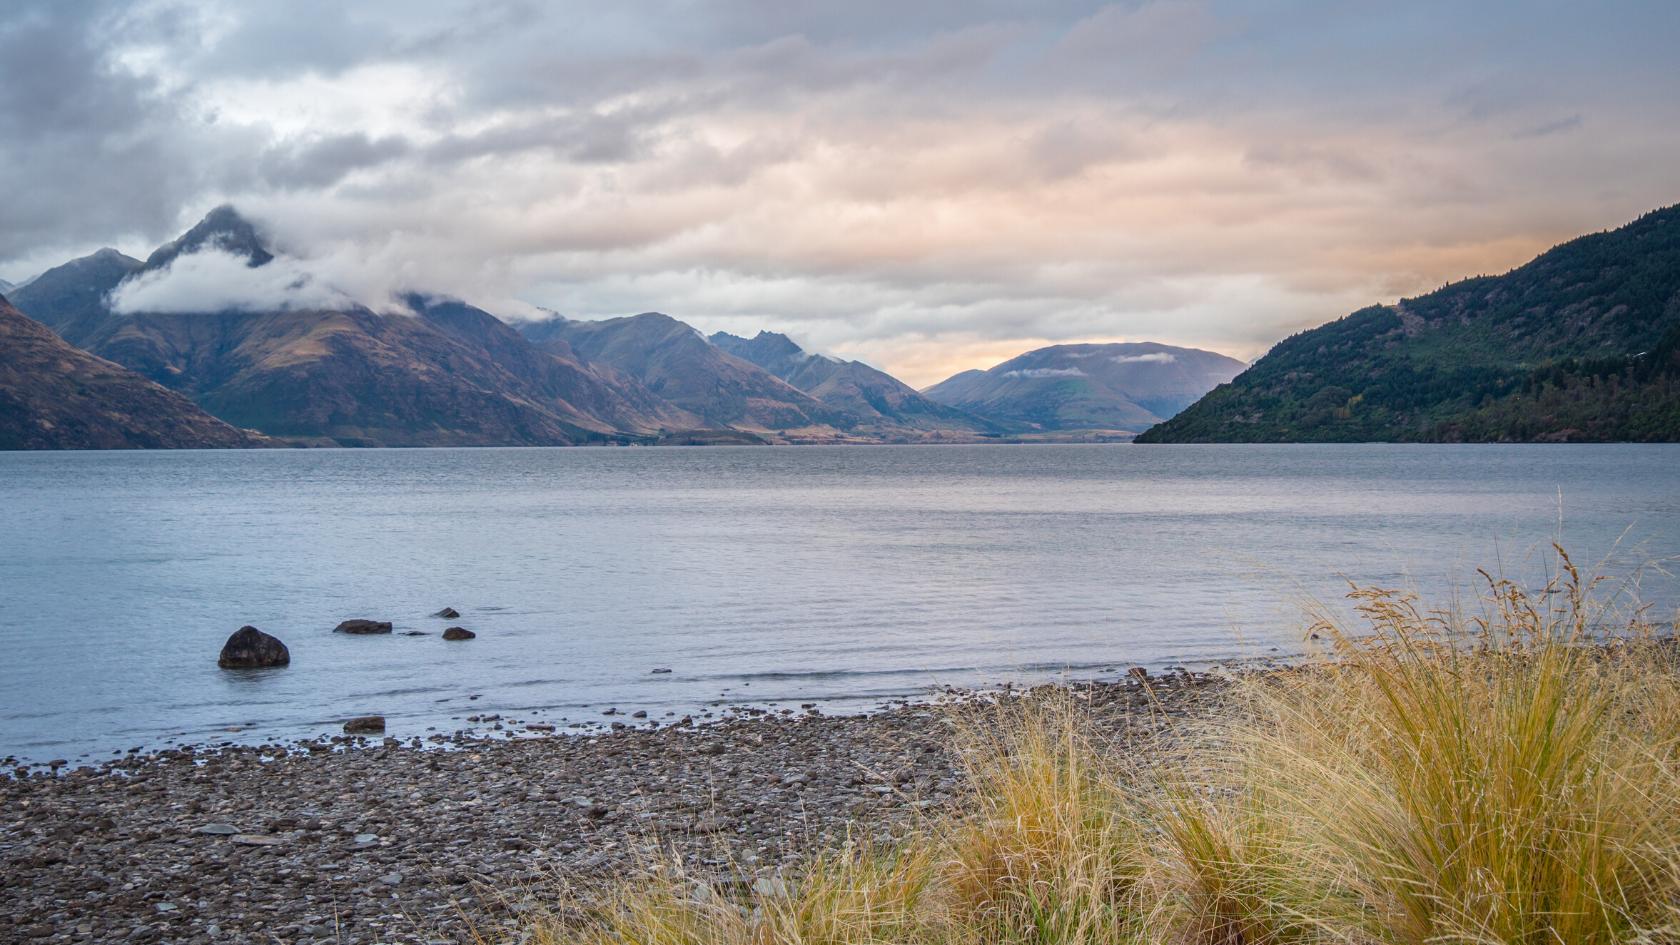 Top 10 New Zealand Beaches of 2019